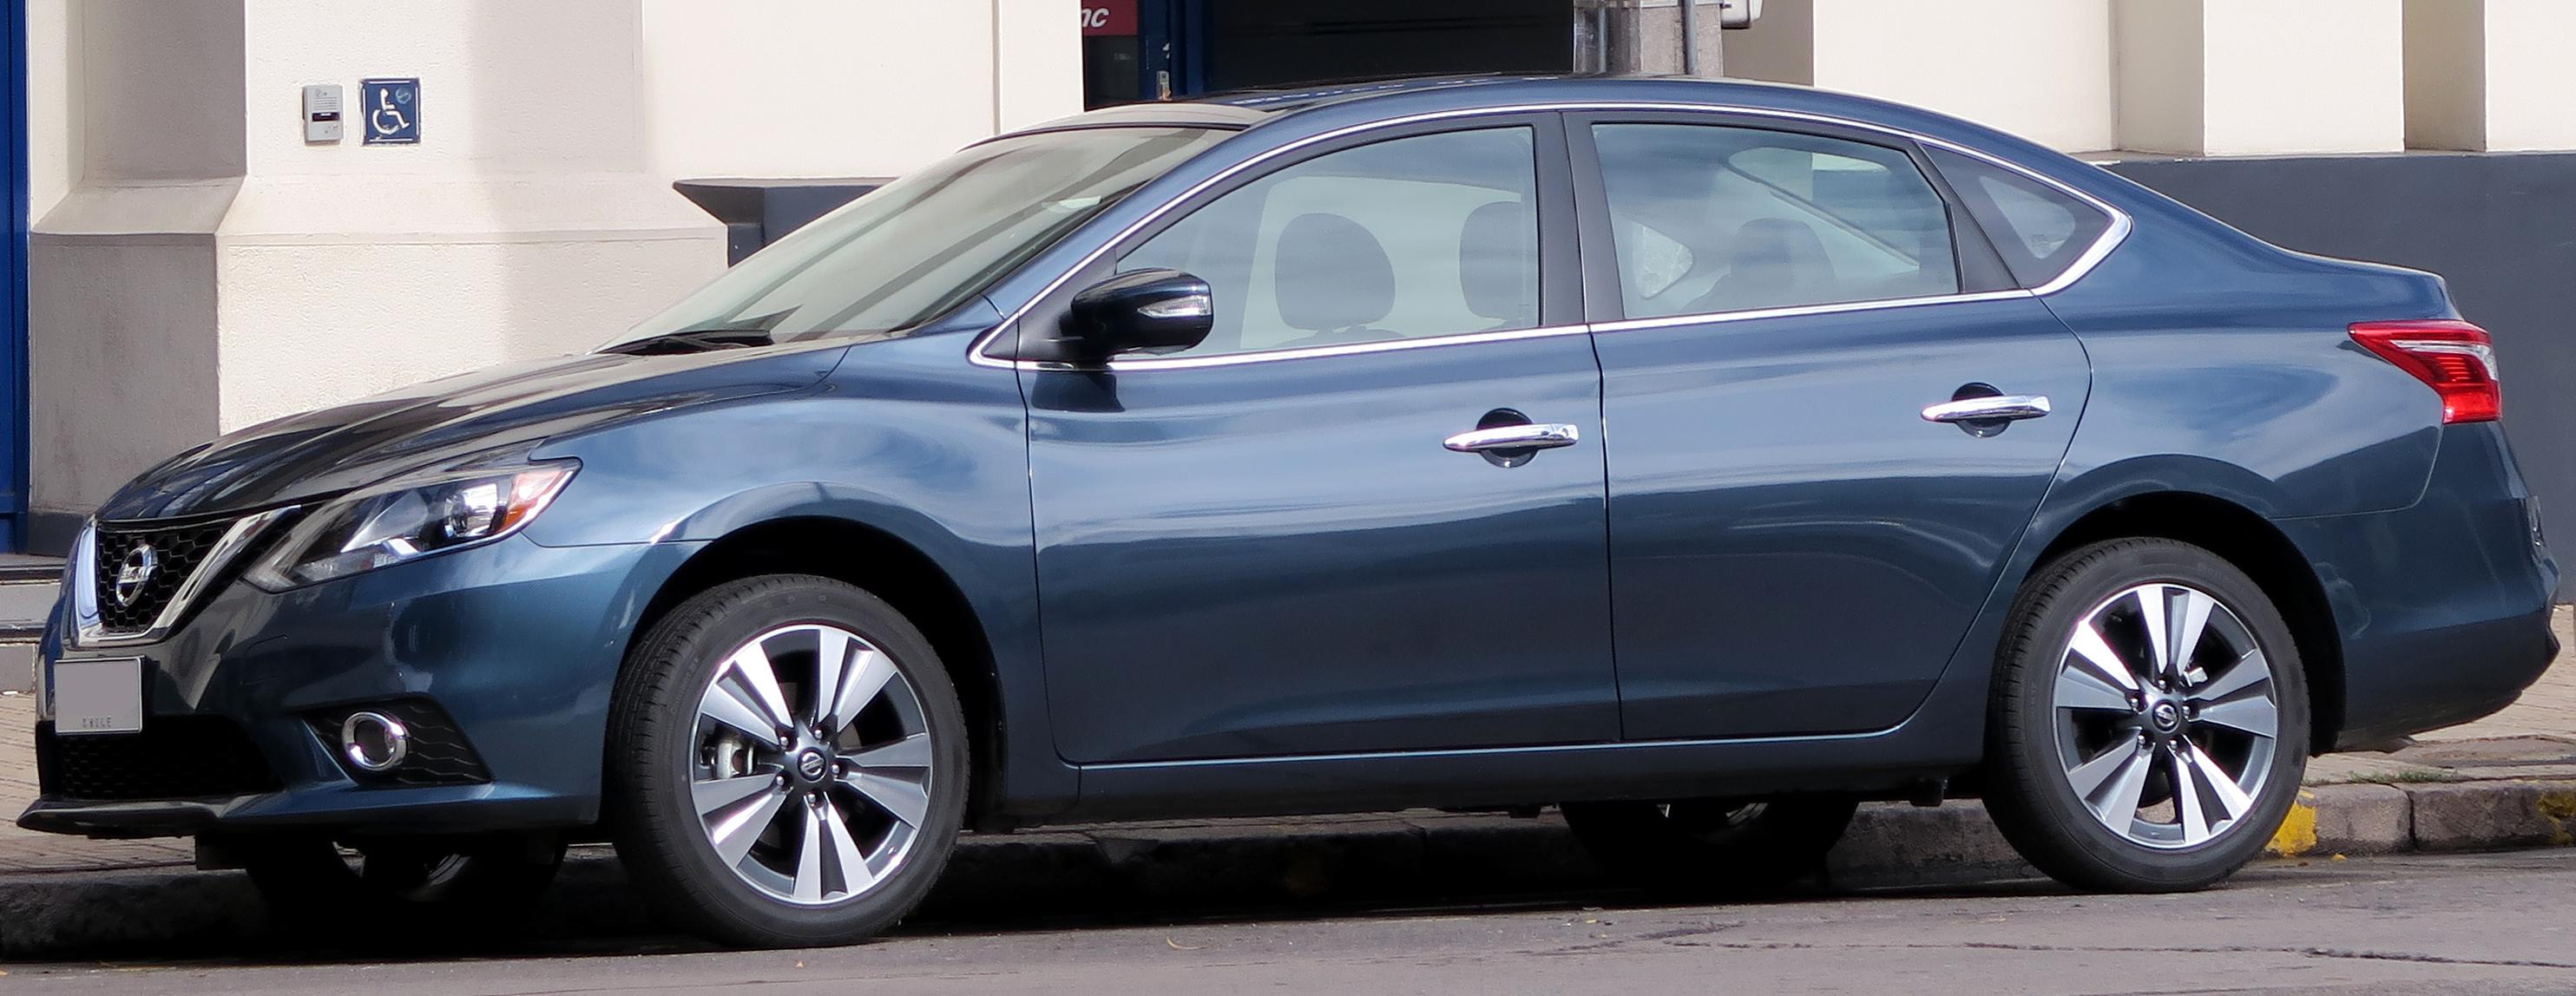 Nissan Sentra VII (B17) 2012 - now Sedan #7